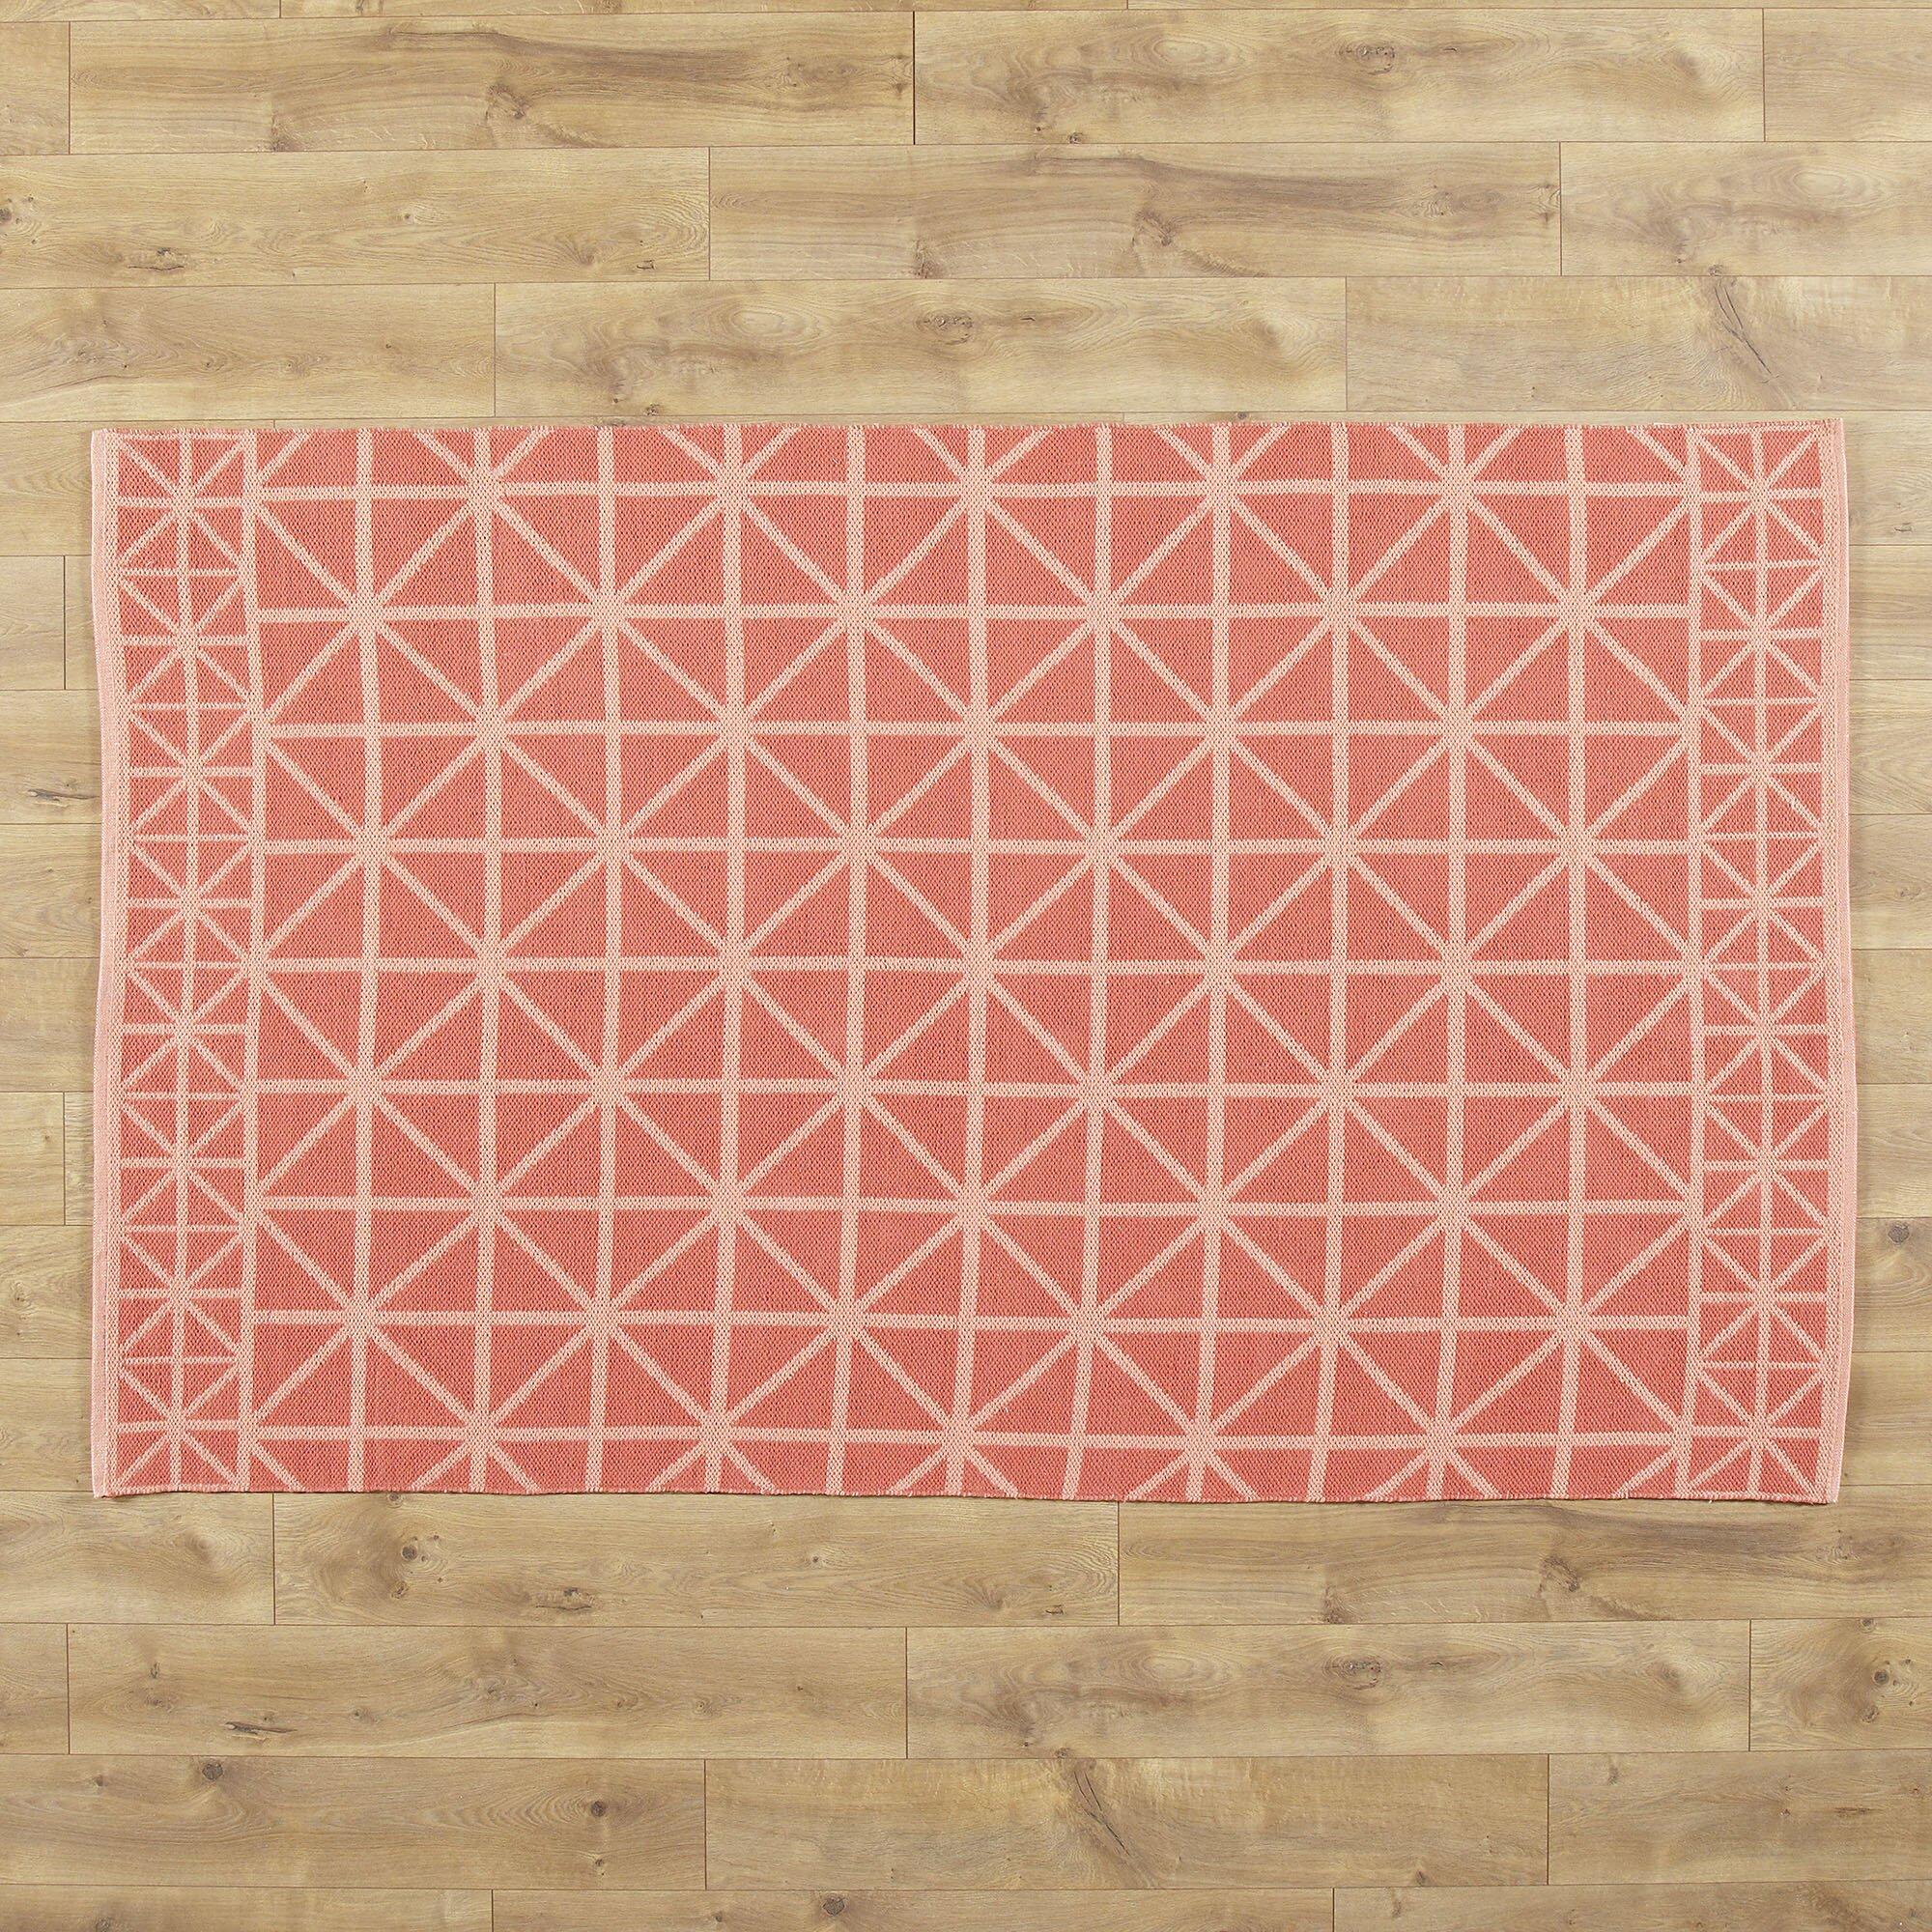 Tri square rug games